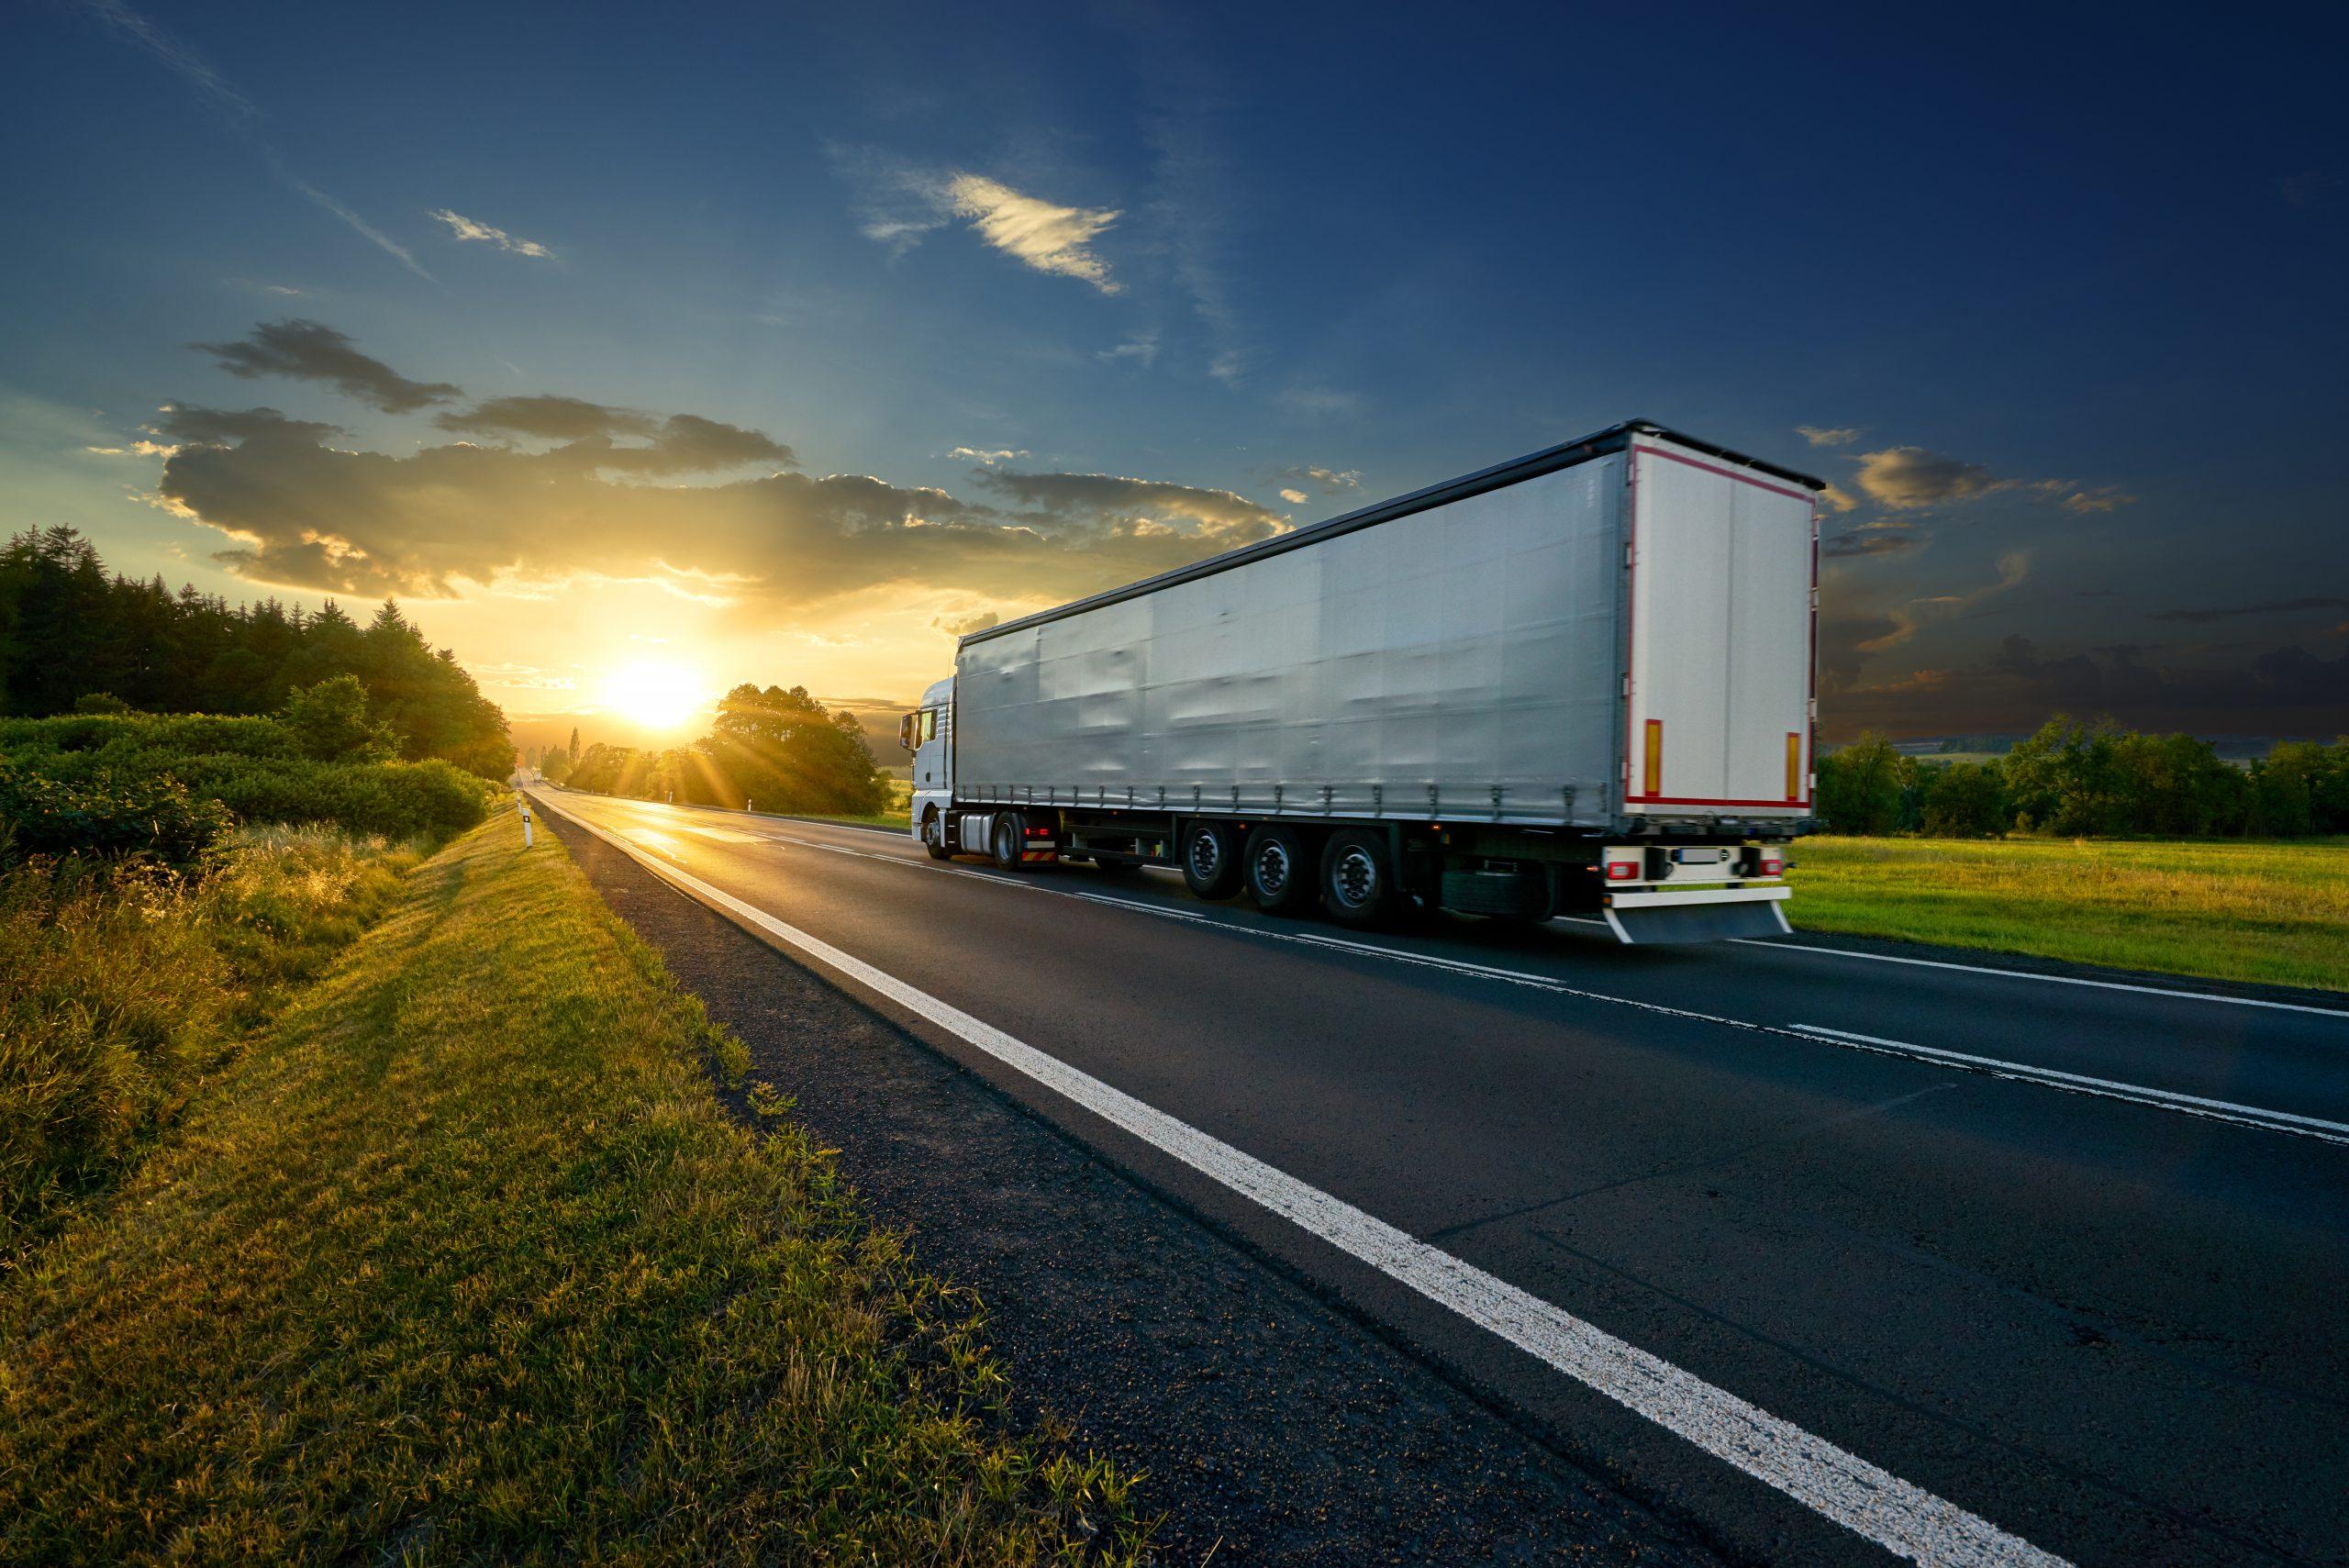 Truck on sunset highway